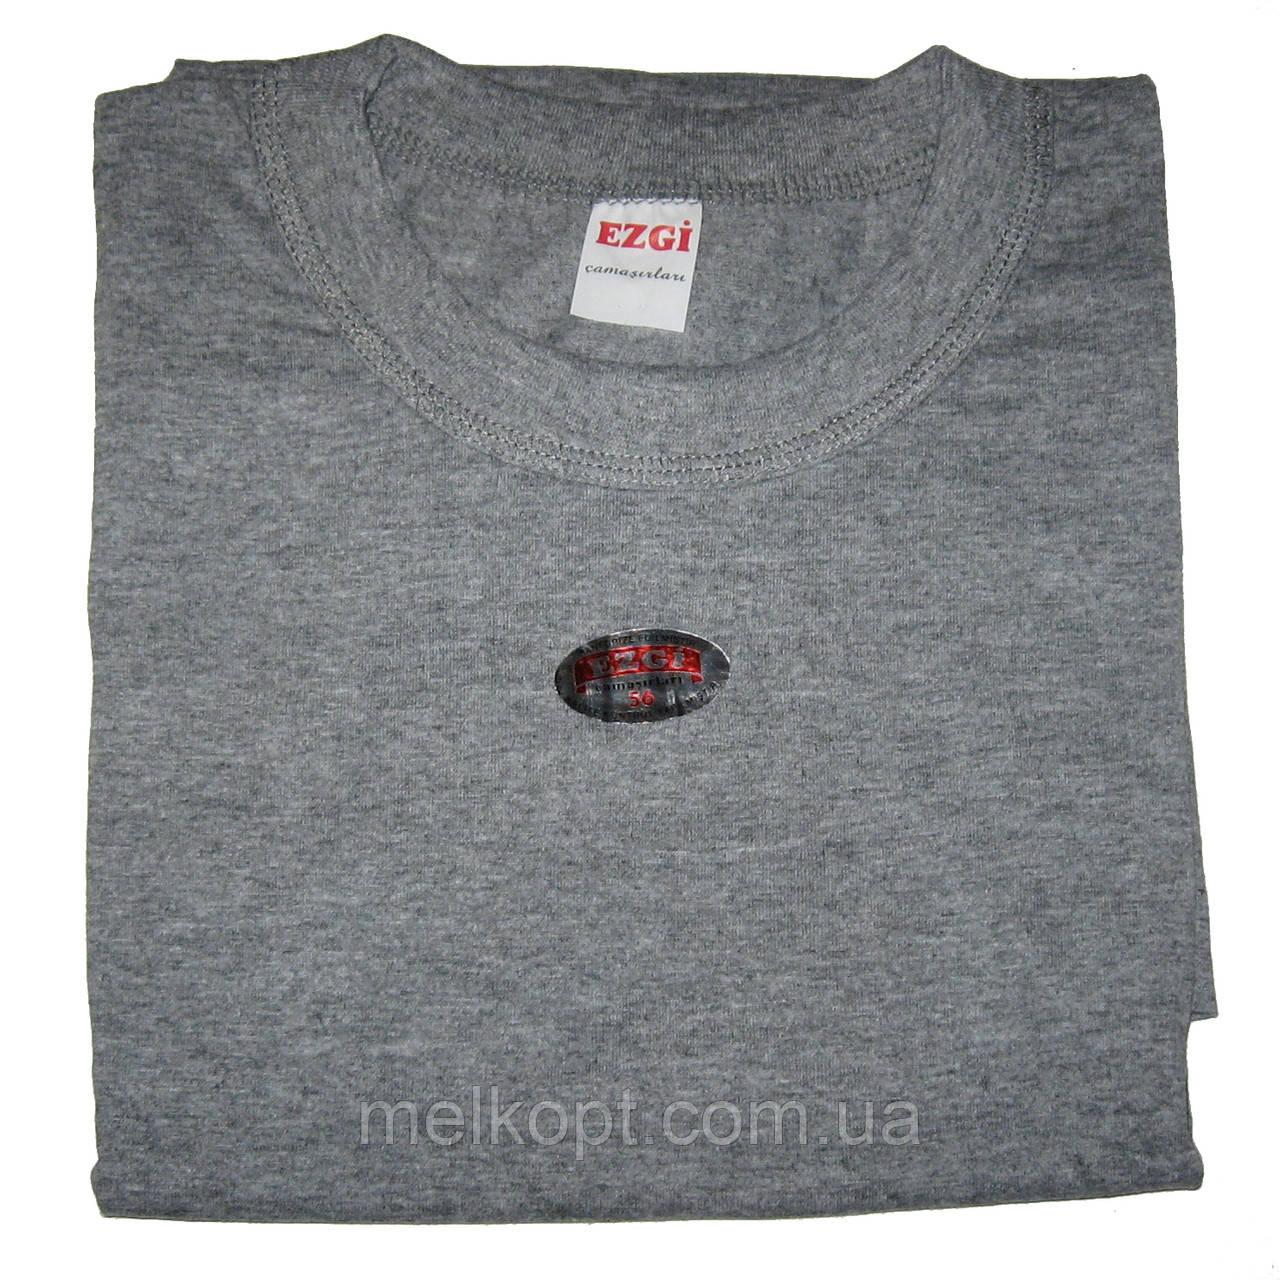 Мужские футболки Ezgi - 55,00 грн./шт. (56-й размер, серые)